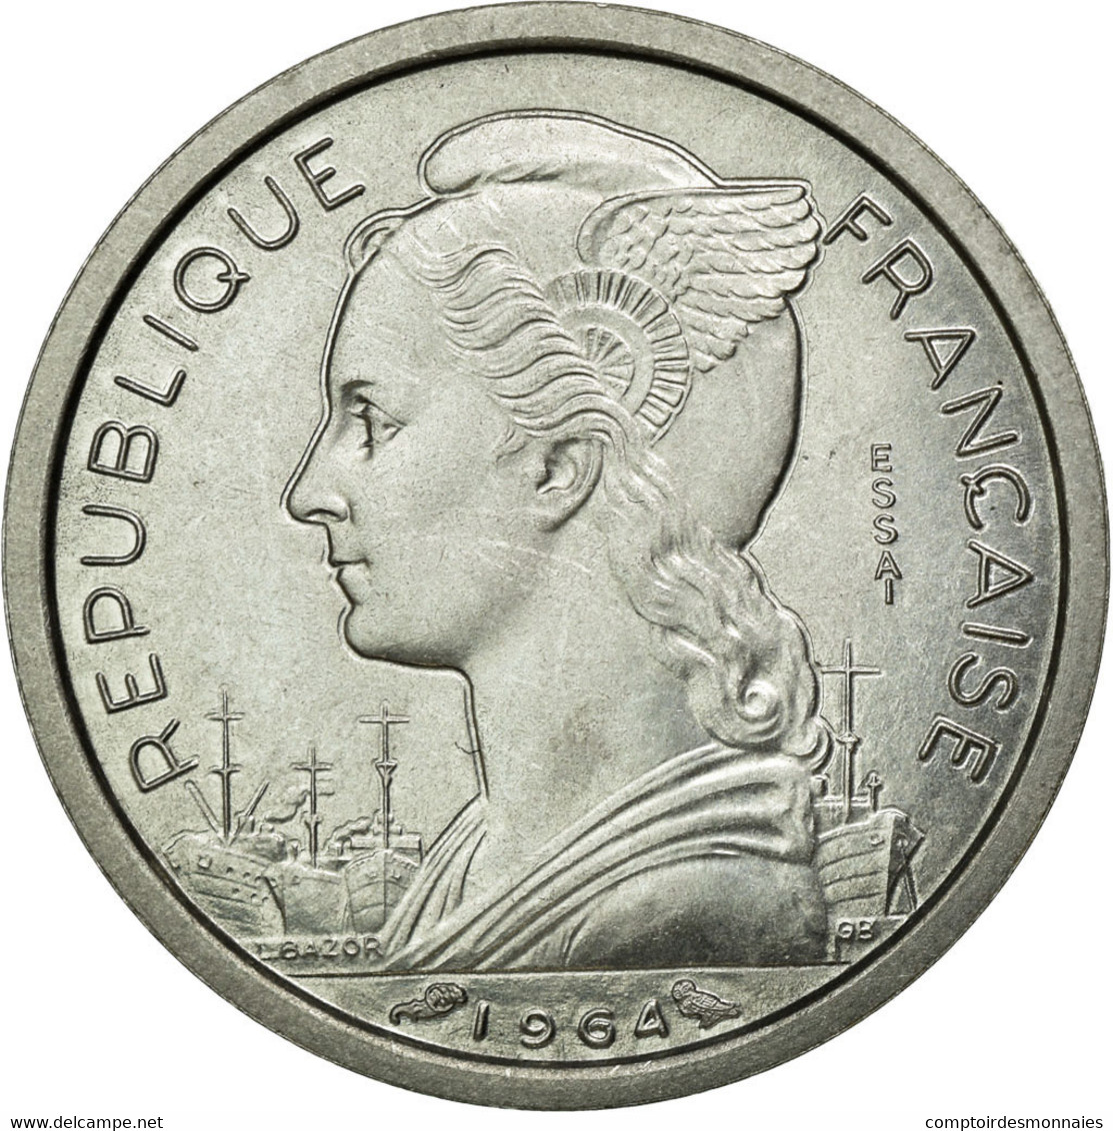 Monnaie, Comoros, Franc, 1964, Paris, FDC, Aluminium, Lecompte:32 - Comoros